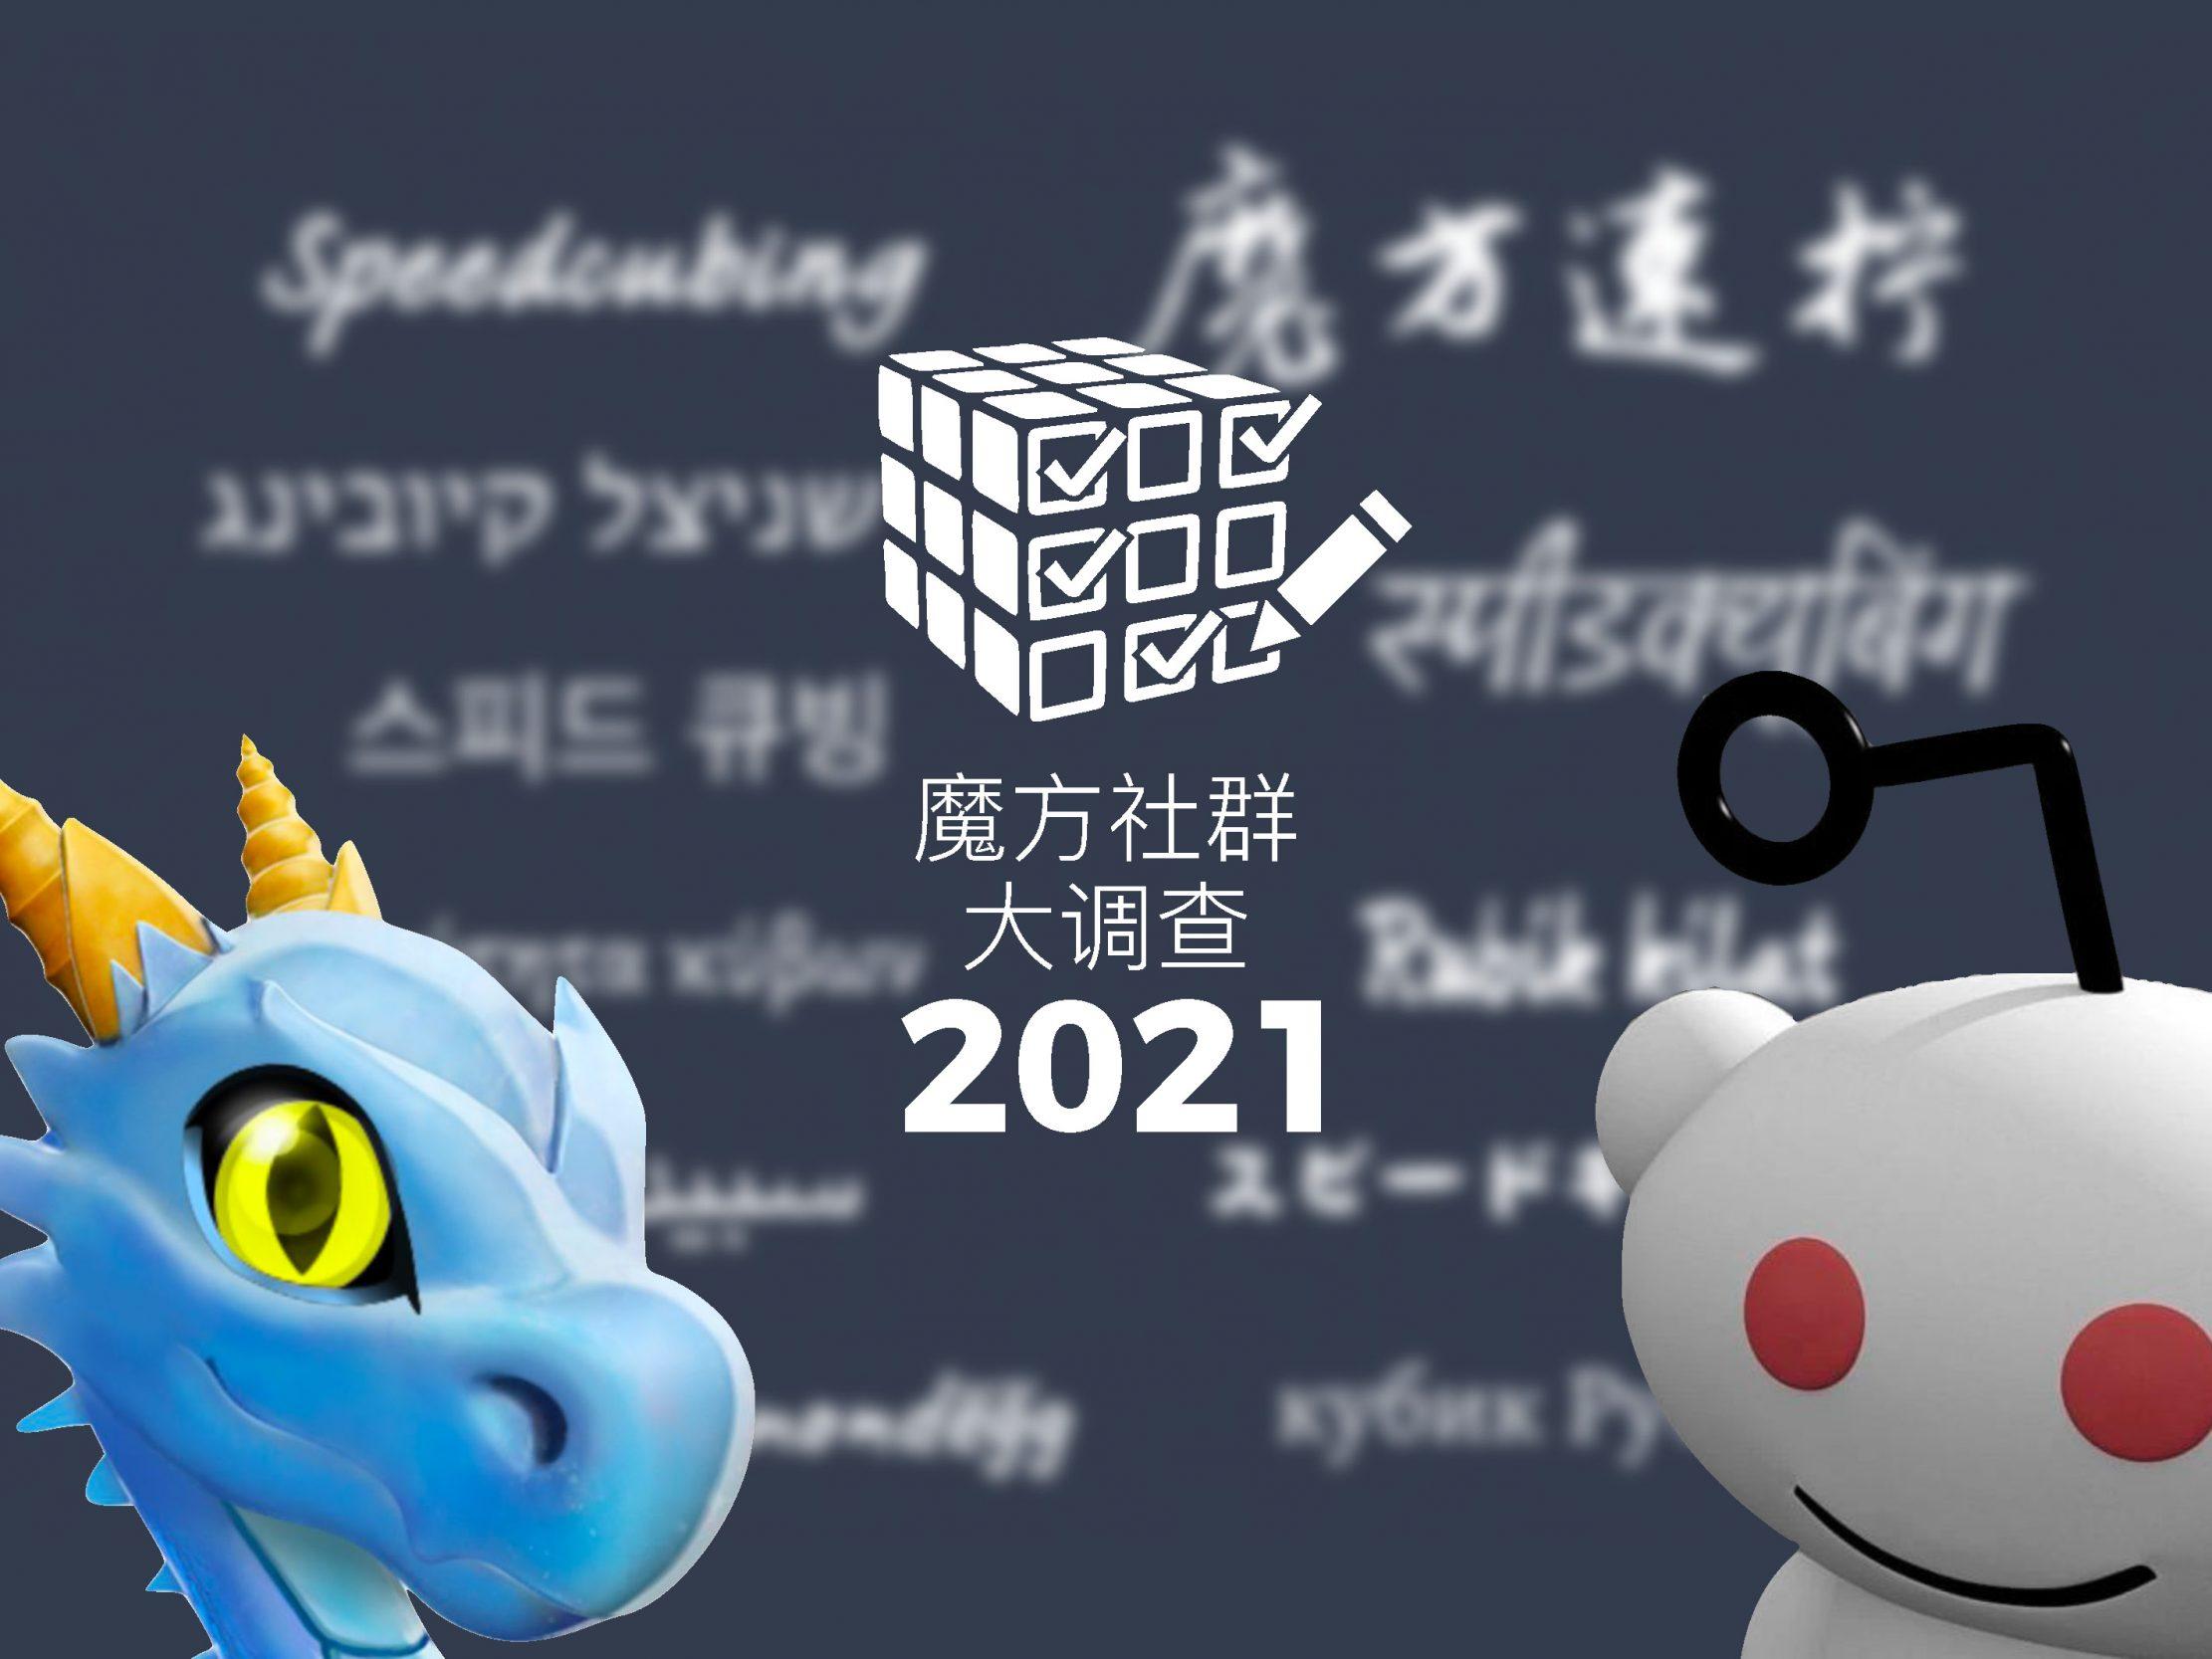 Cubing Megasurvey 2021